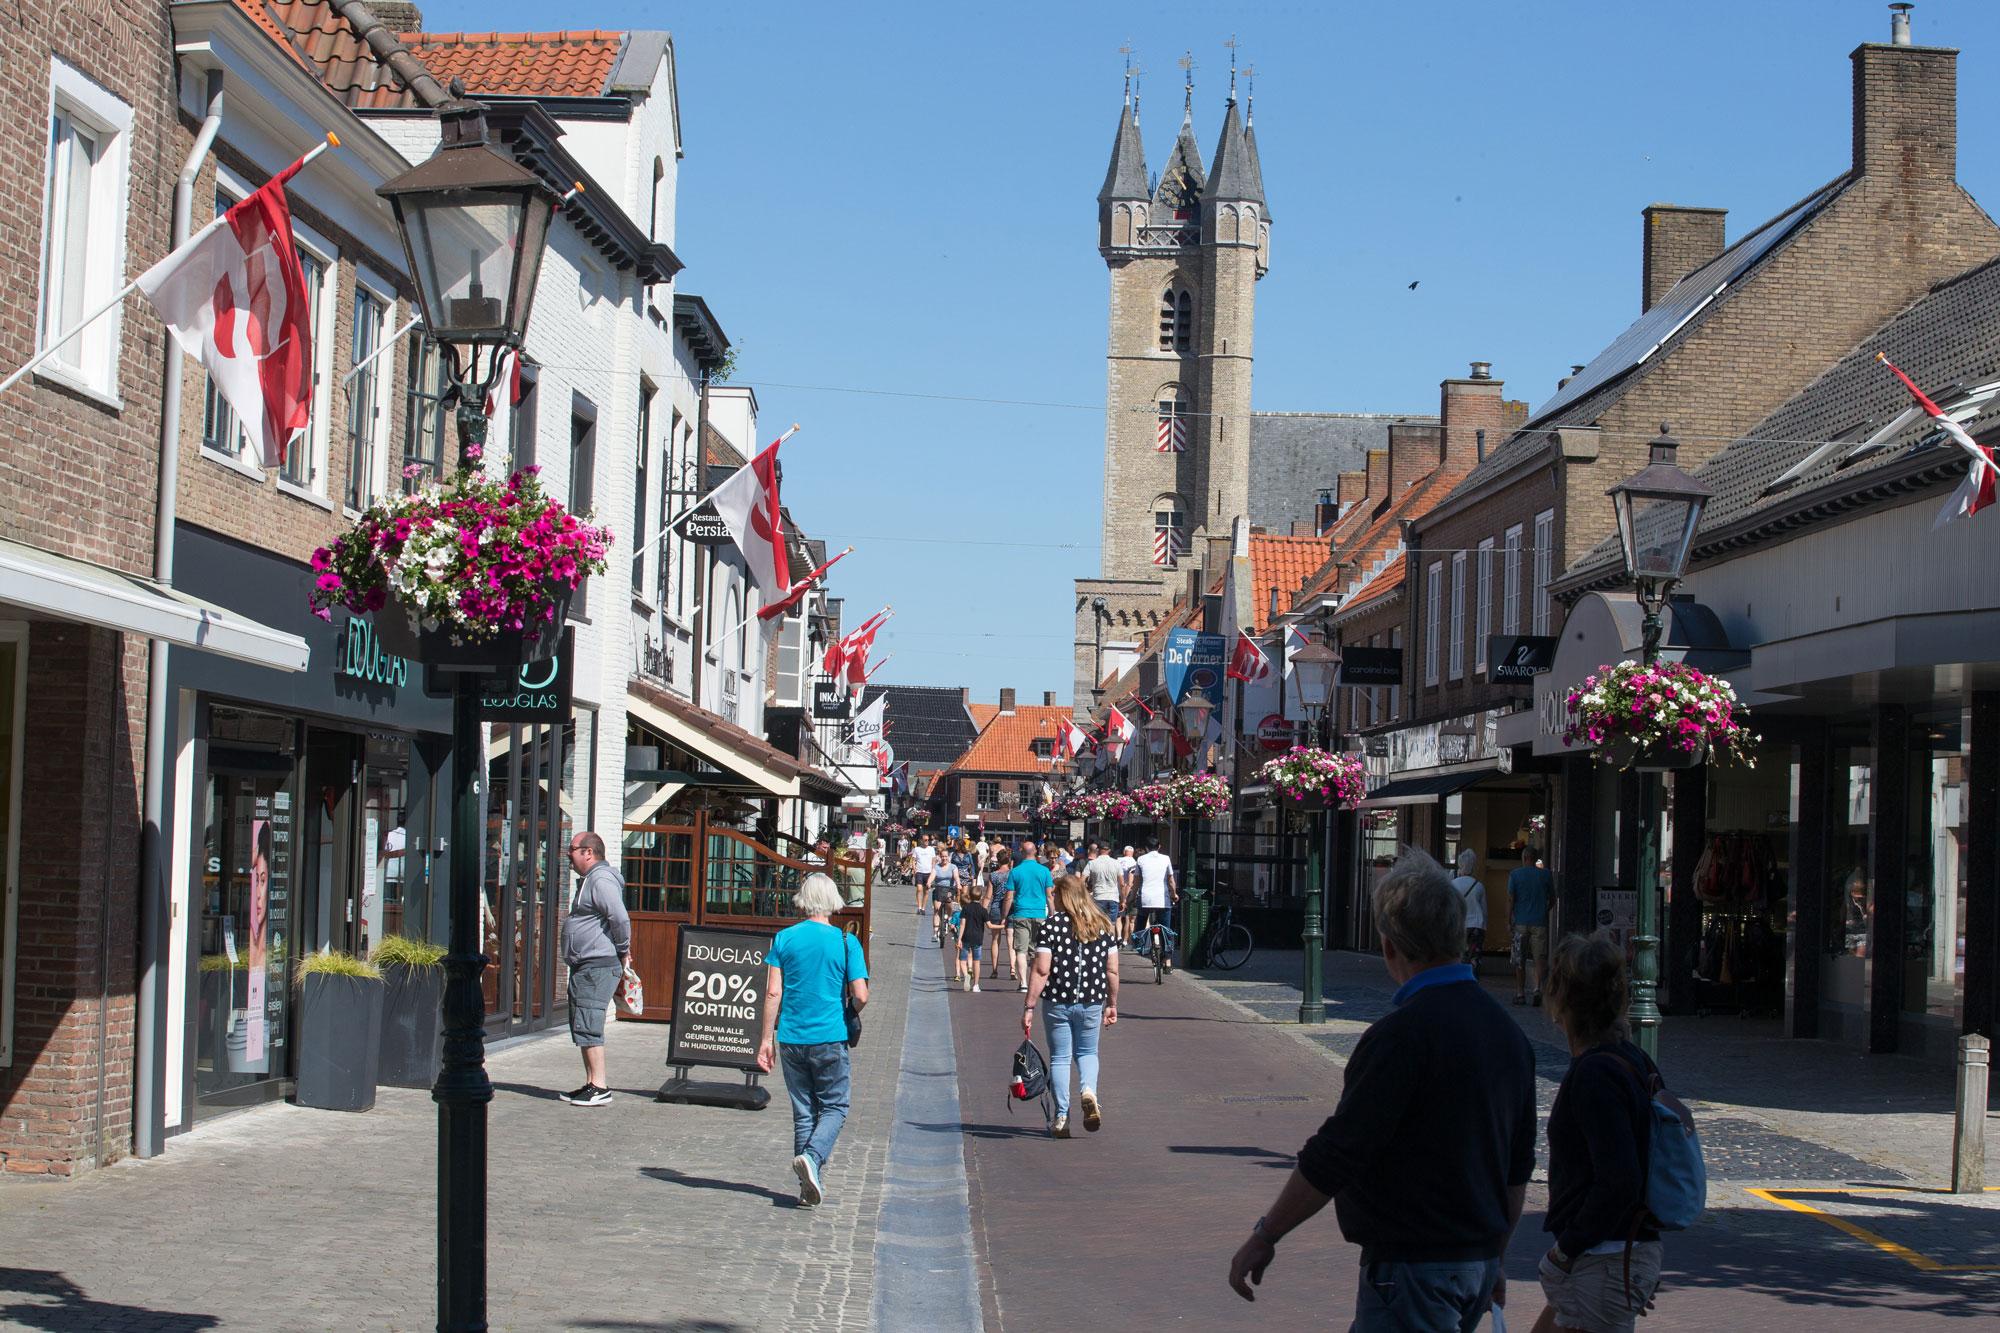 People walk on a shopping street in Sluis, Netherlands, near the Belgian-Dutch border on May 31.